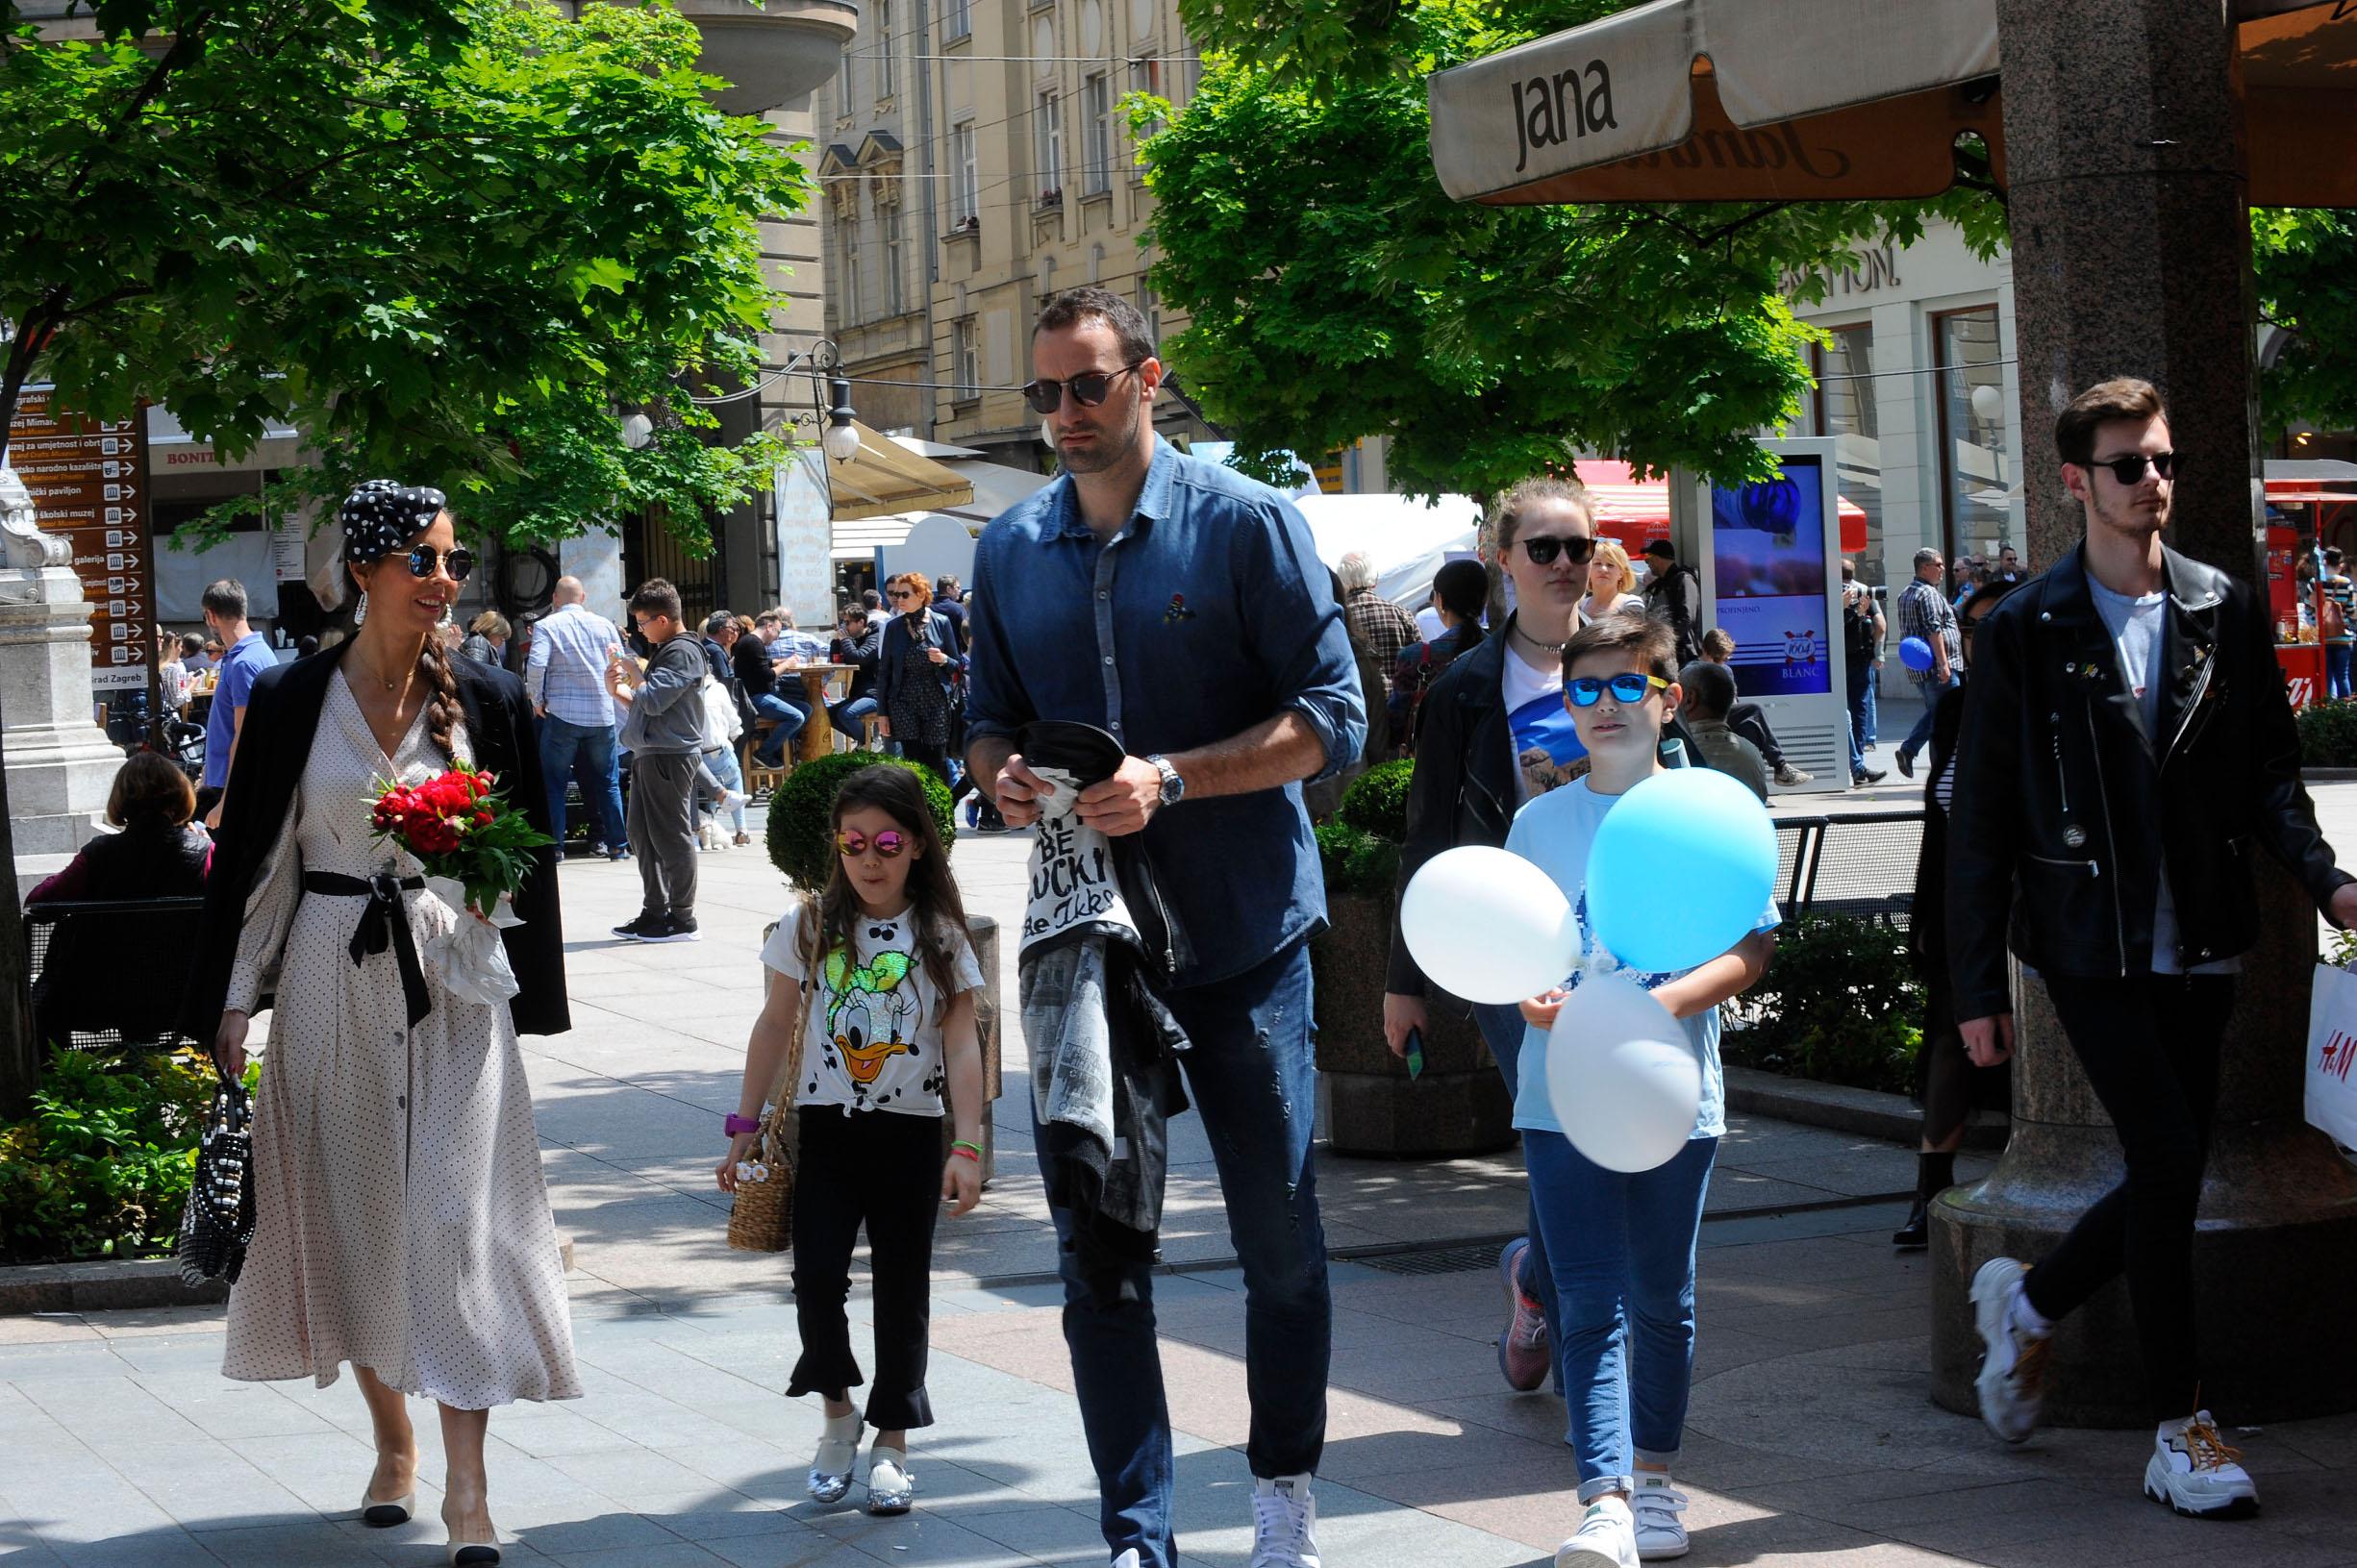 Spica / Zagreb 11.05.2019. / foto: Maja Jurovic / Olja Vori i Igor Vori i kcer Nika i sin Petar